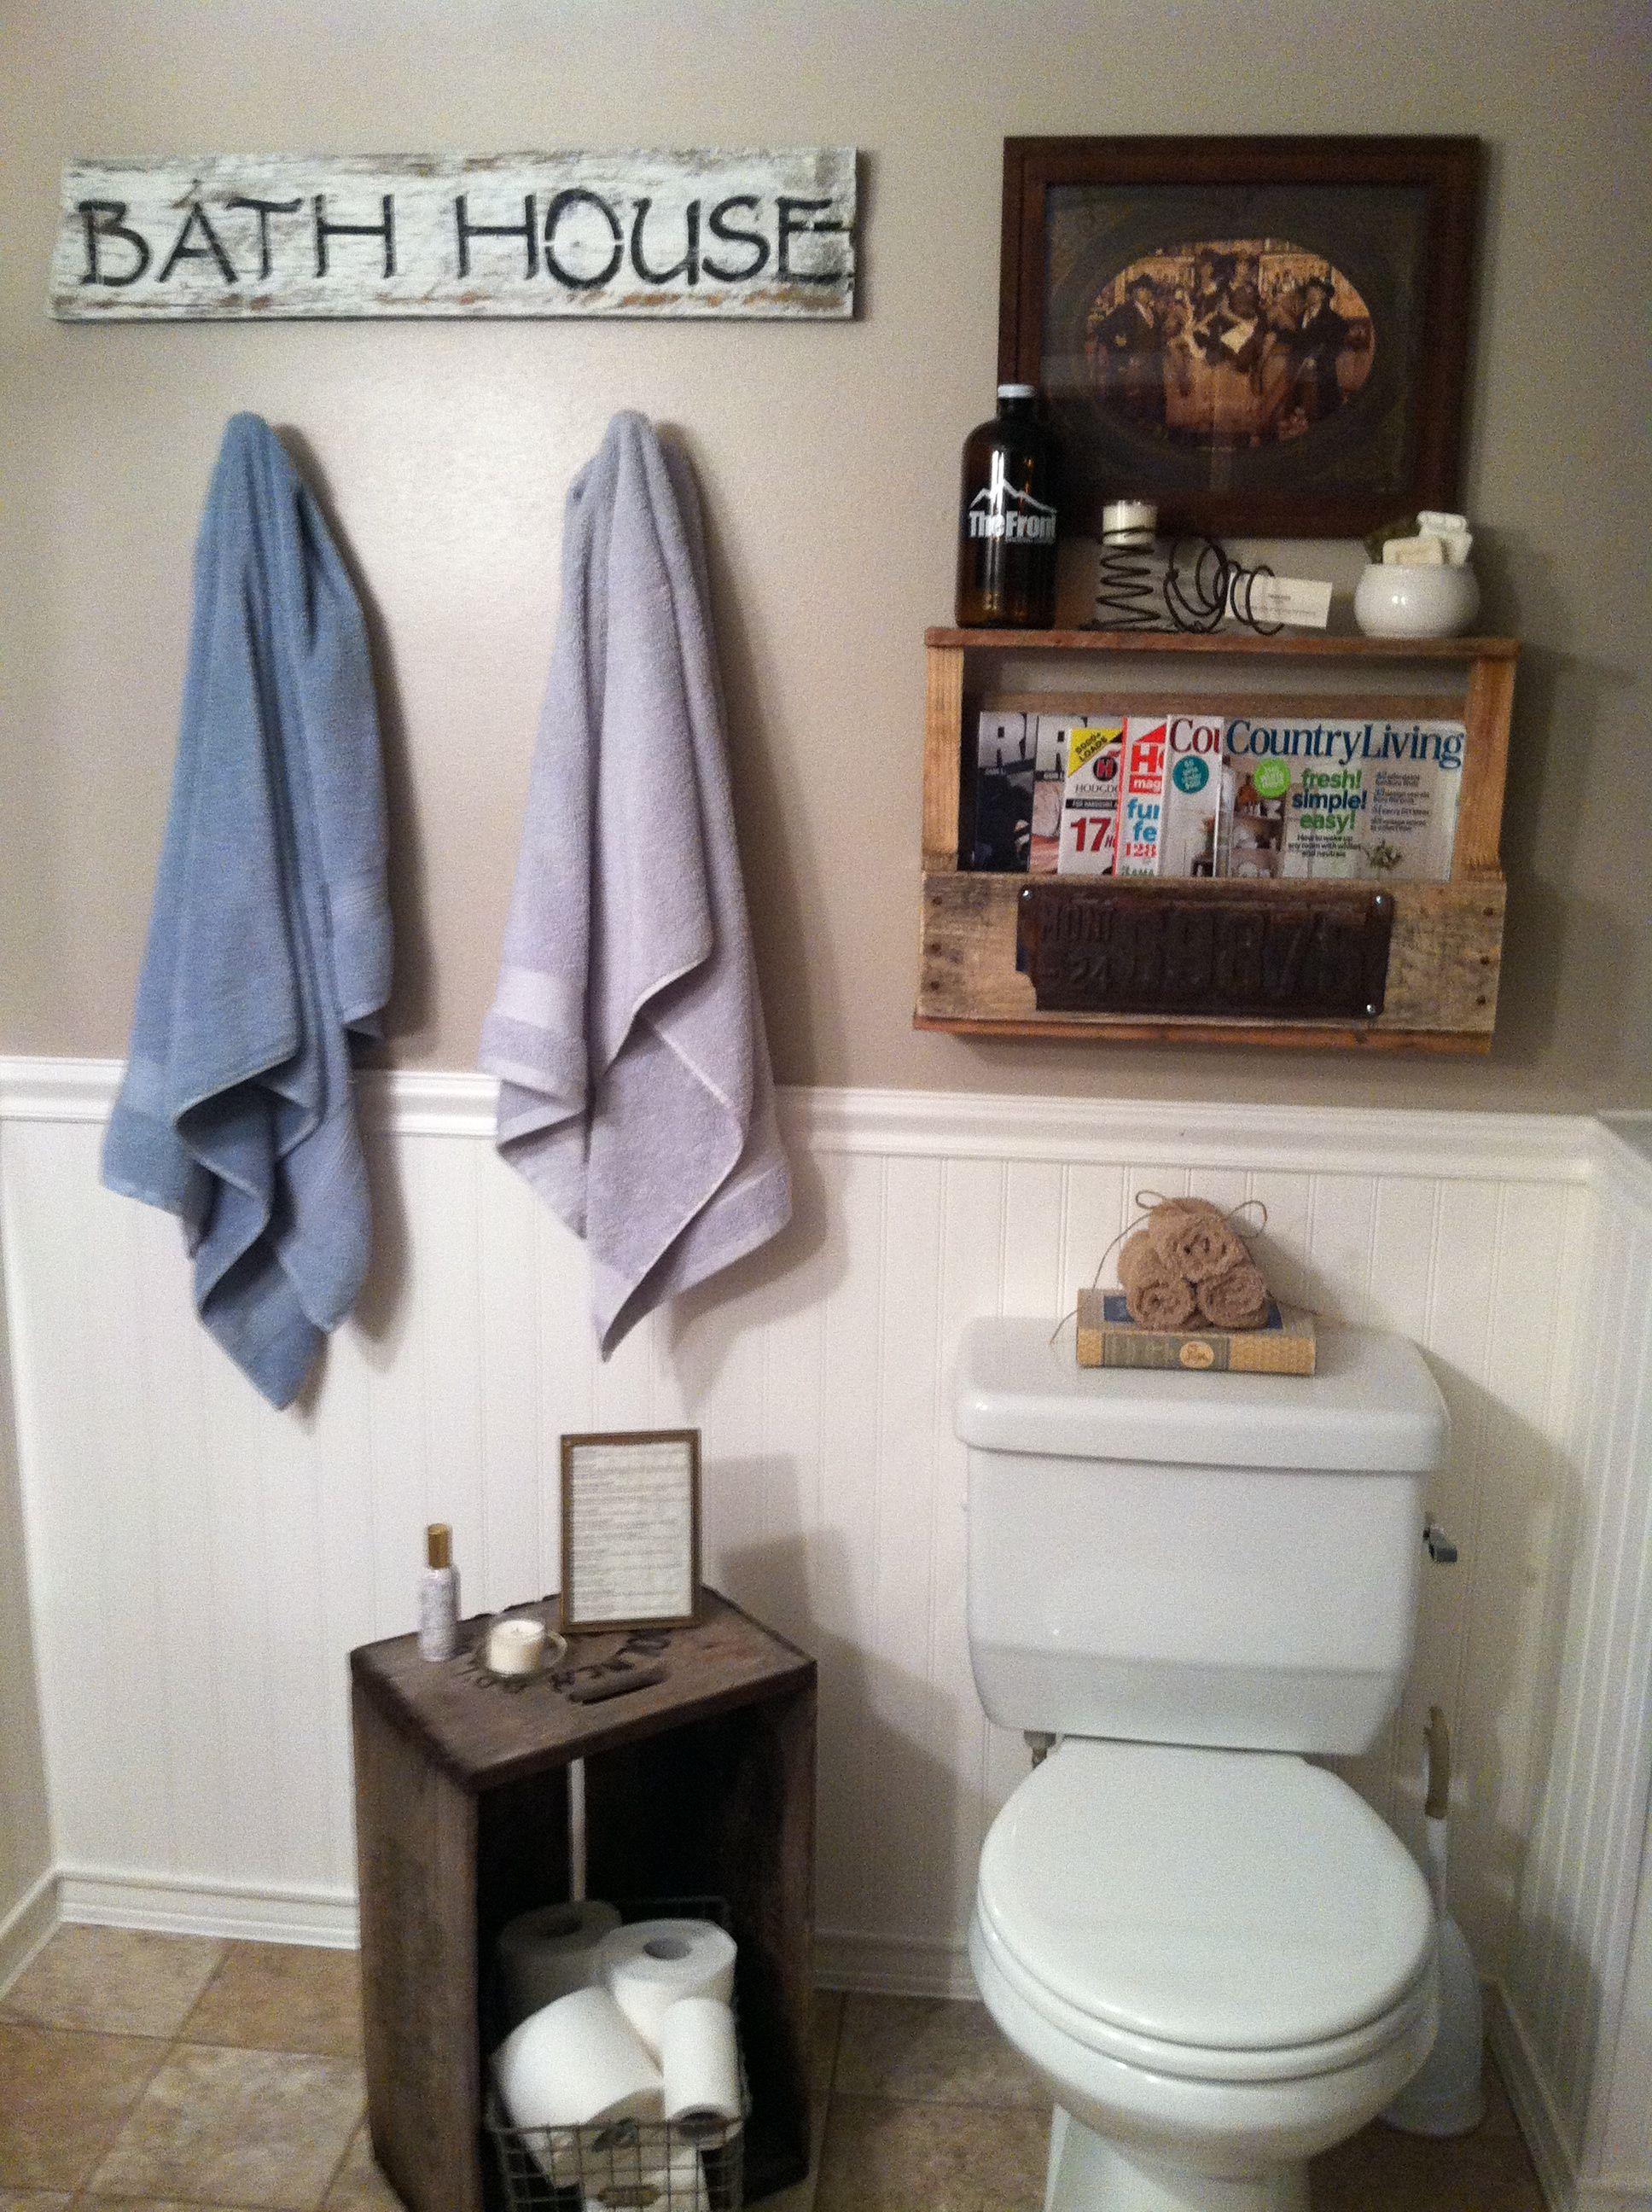 ... shelf...bathroom shelving and storage ideas | in my home | Pinterest